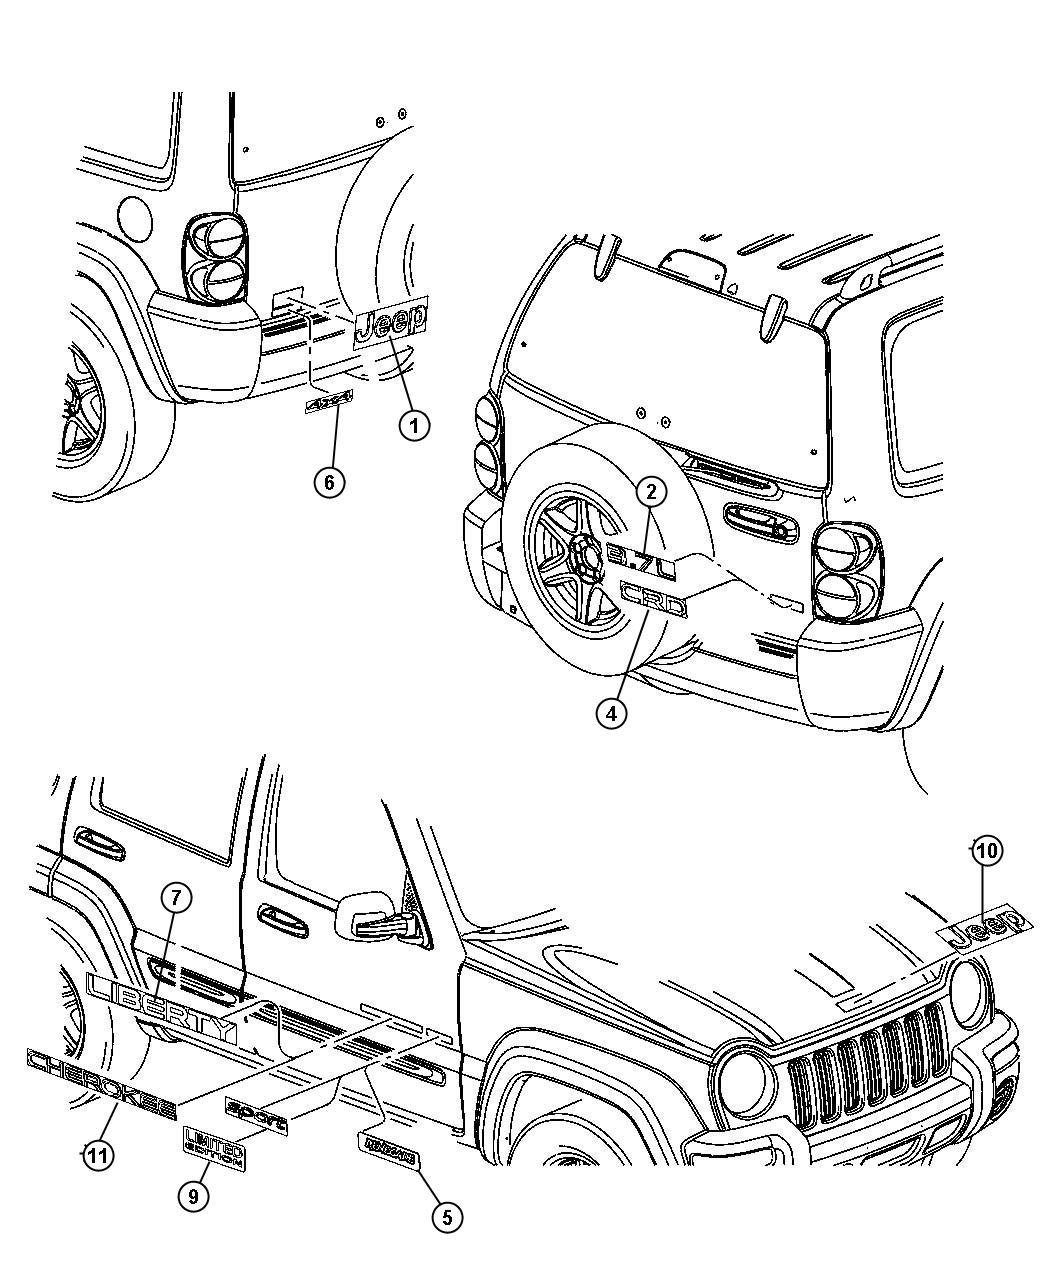 5JN01CA1AA     Jeep    Nameplate Dull finish Nameplates